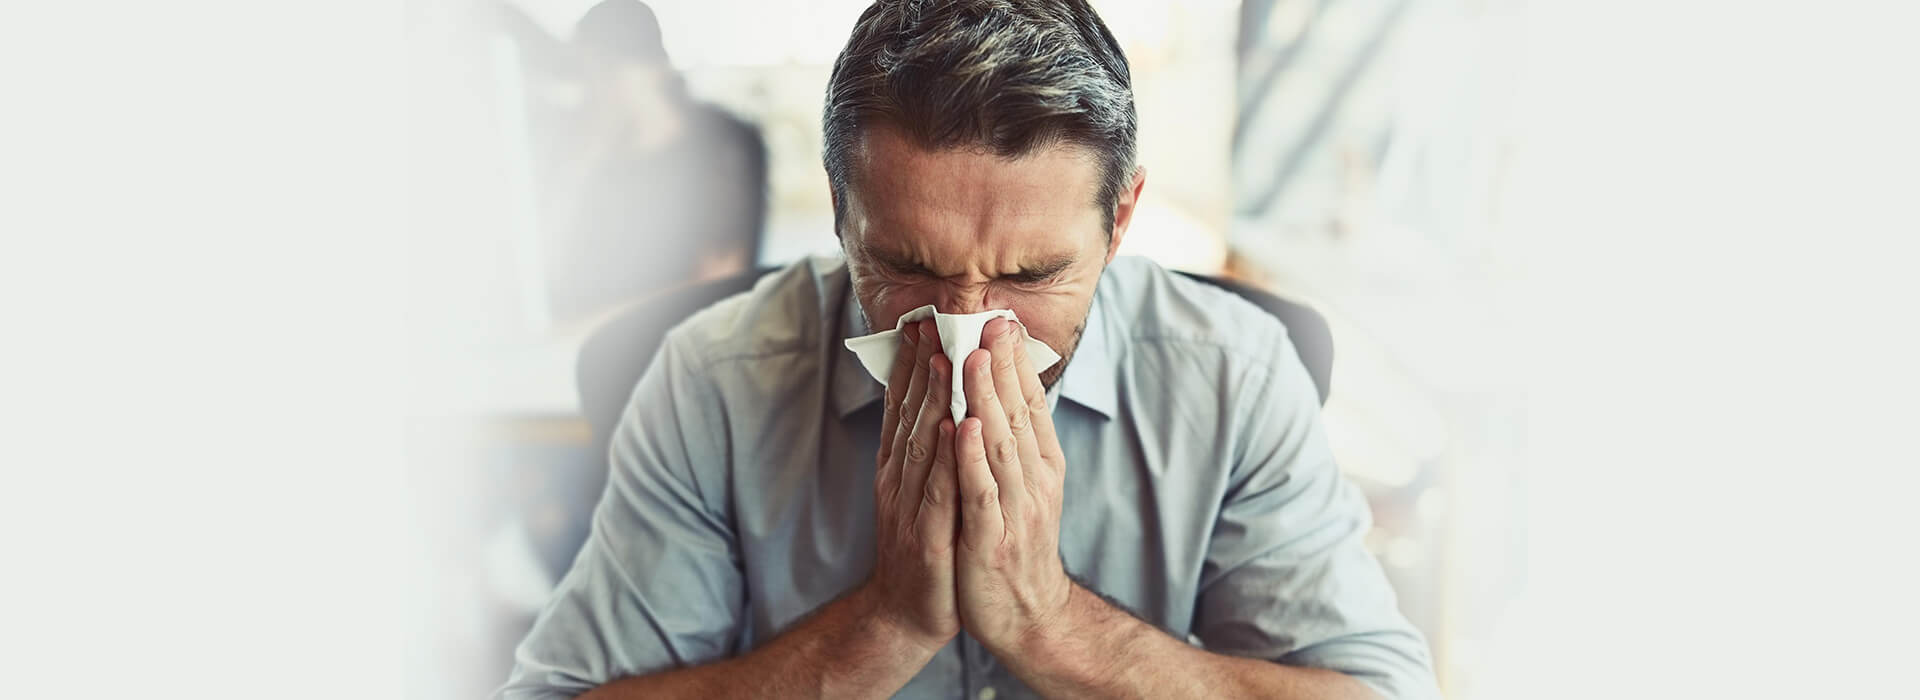 Dr. Reddy's Flu Prevention Protocol